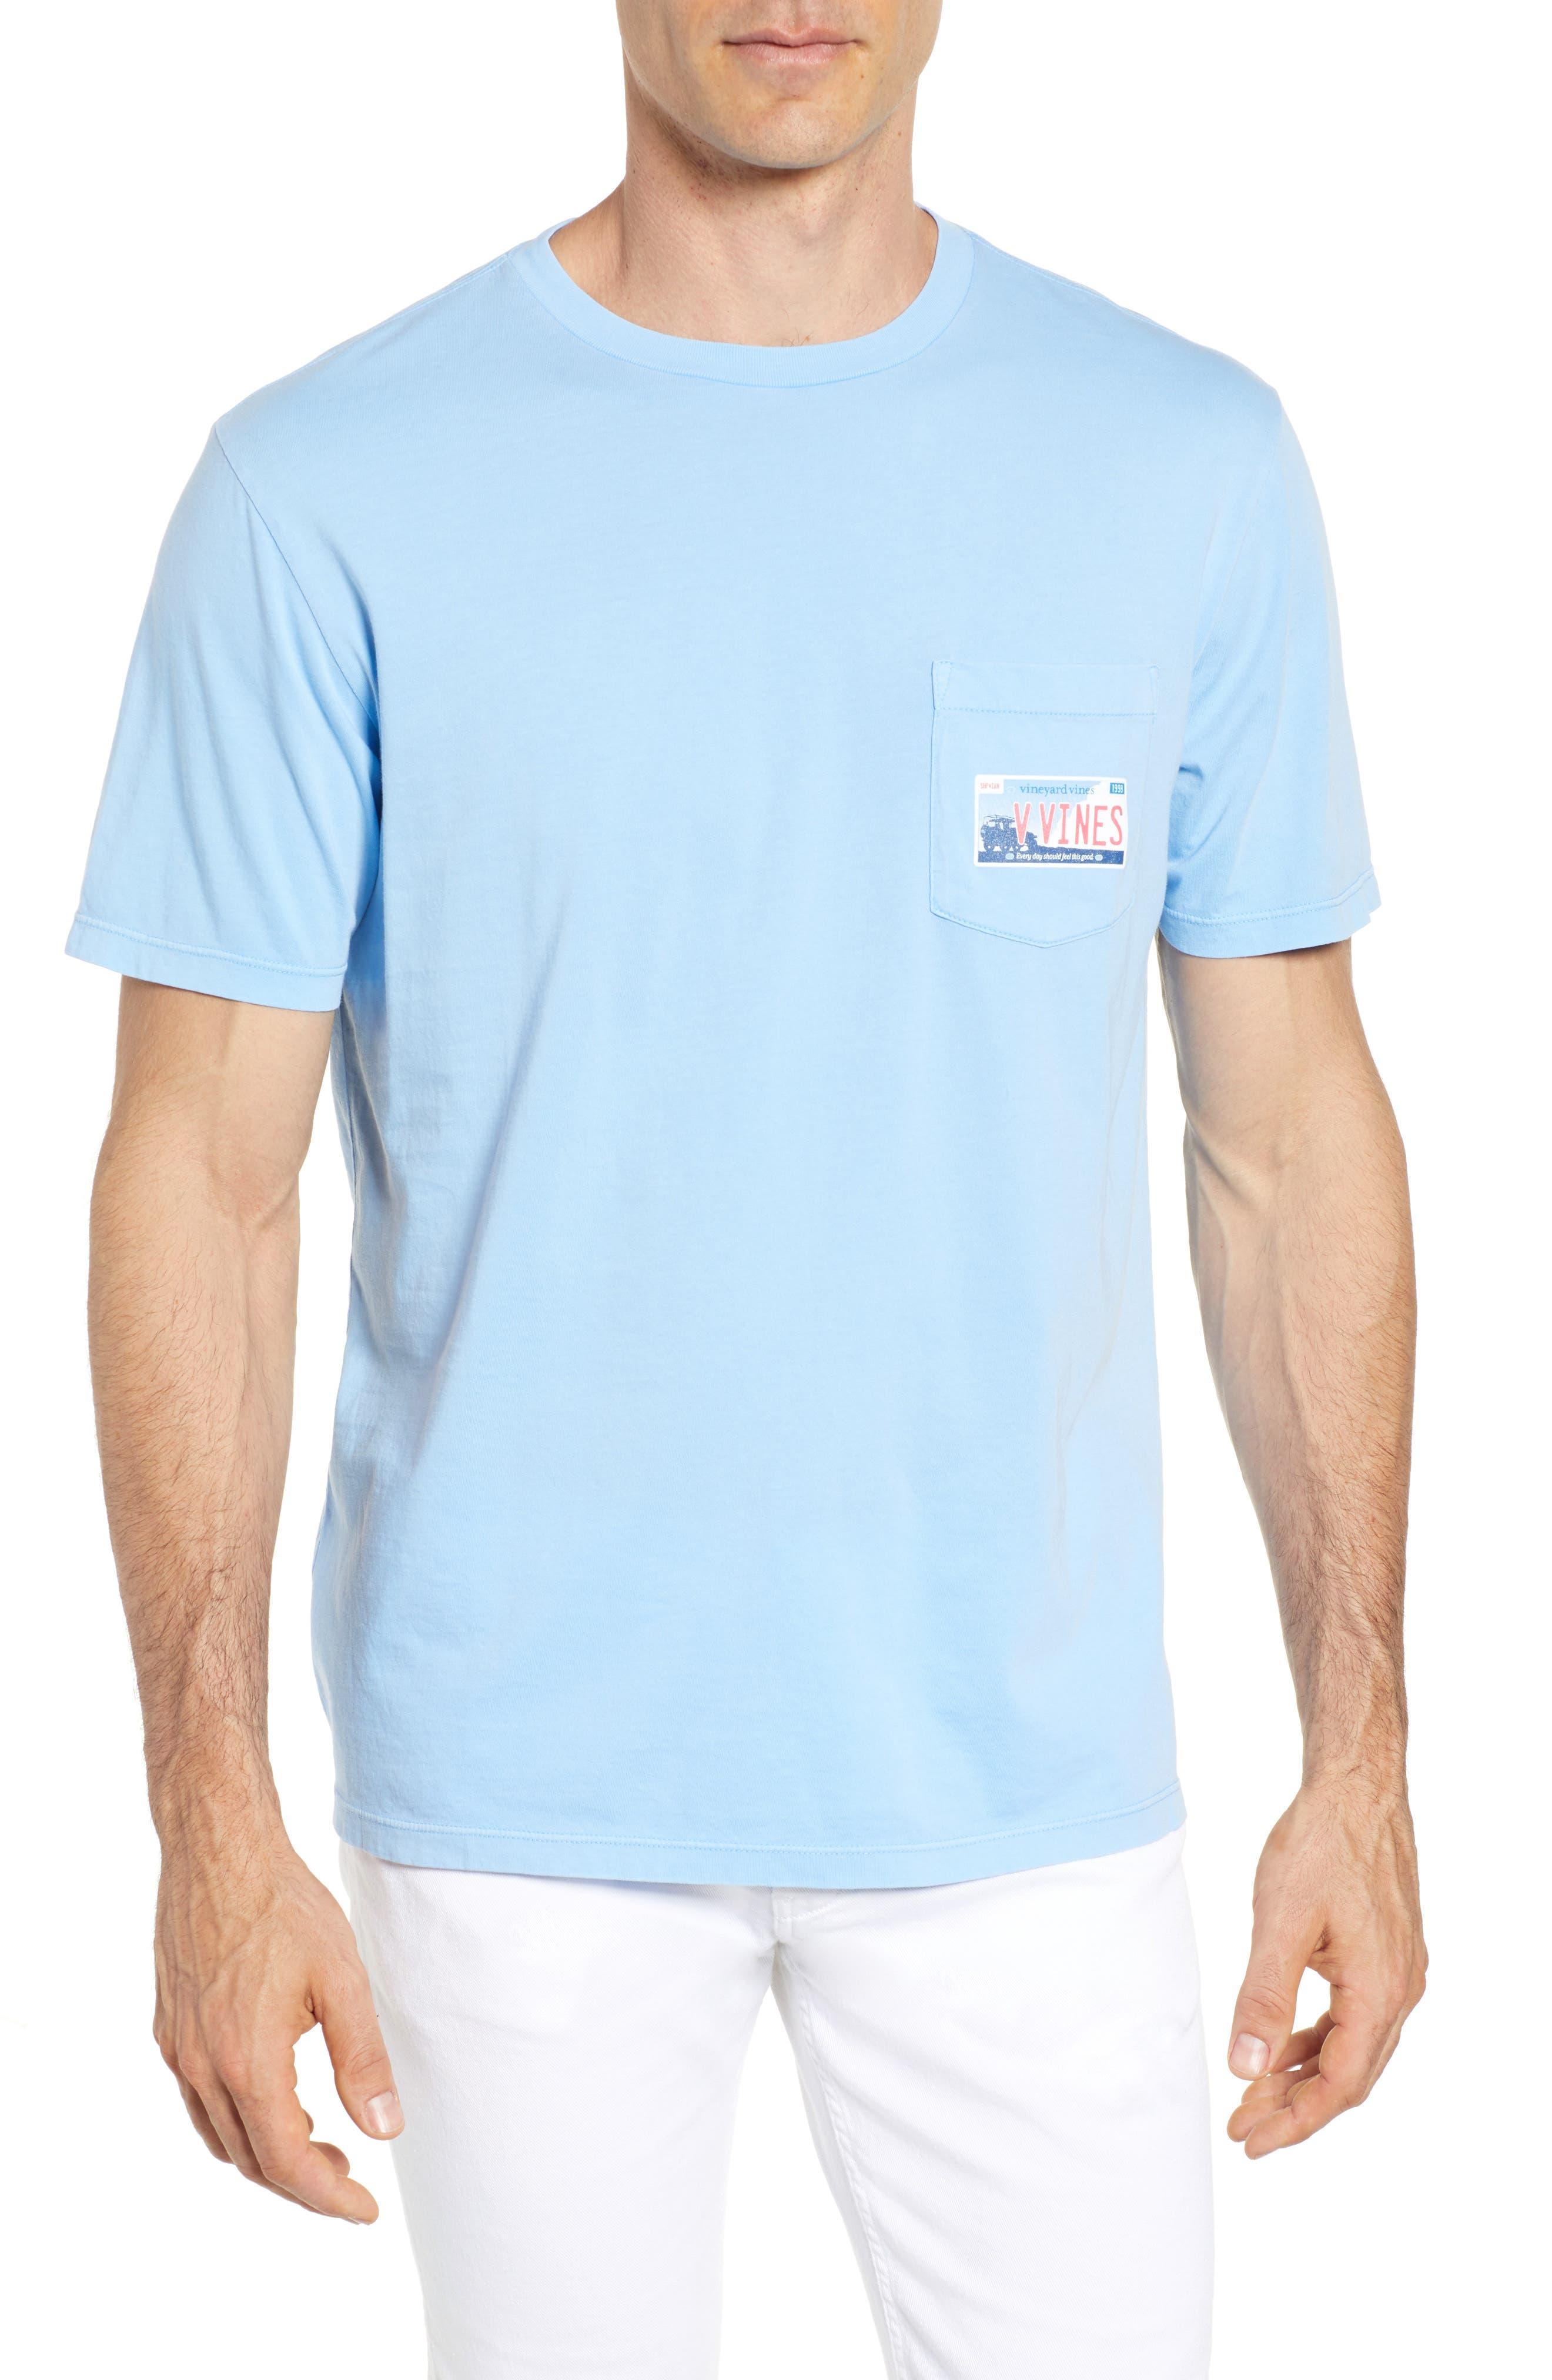 Tie Guys Plate Regular Fit Crewneck T-Shirt,                             Main thumbnail 1, color,                             456